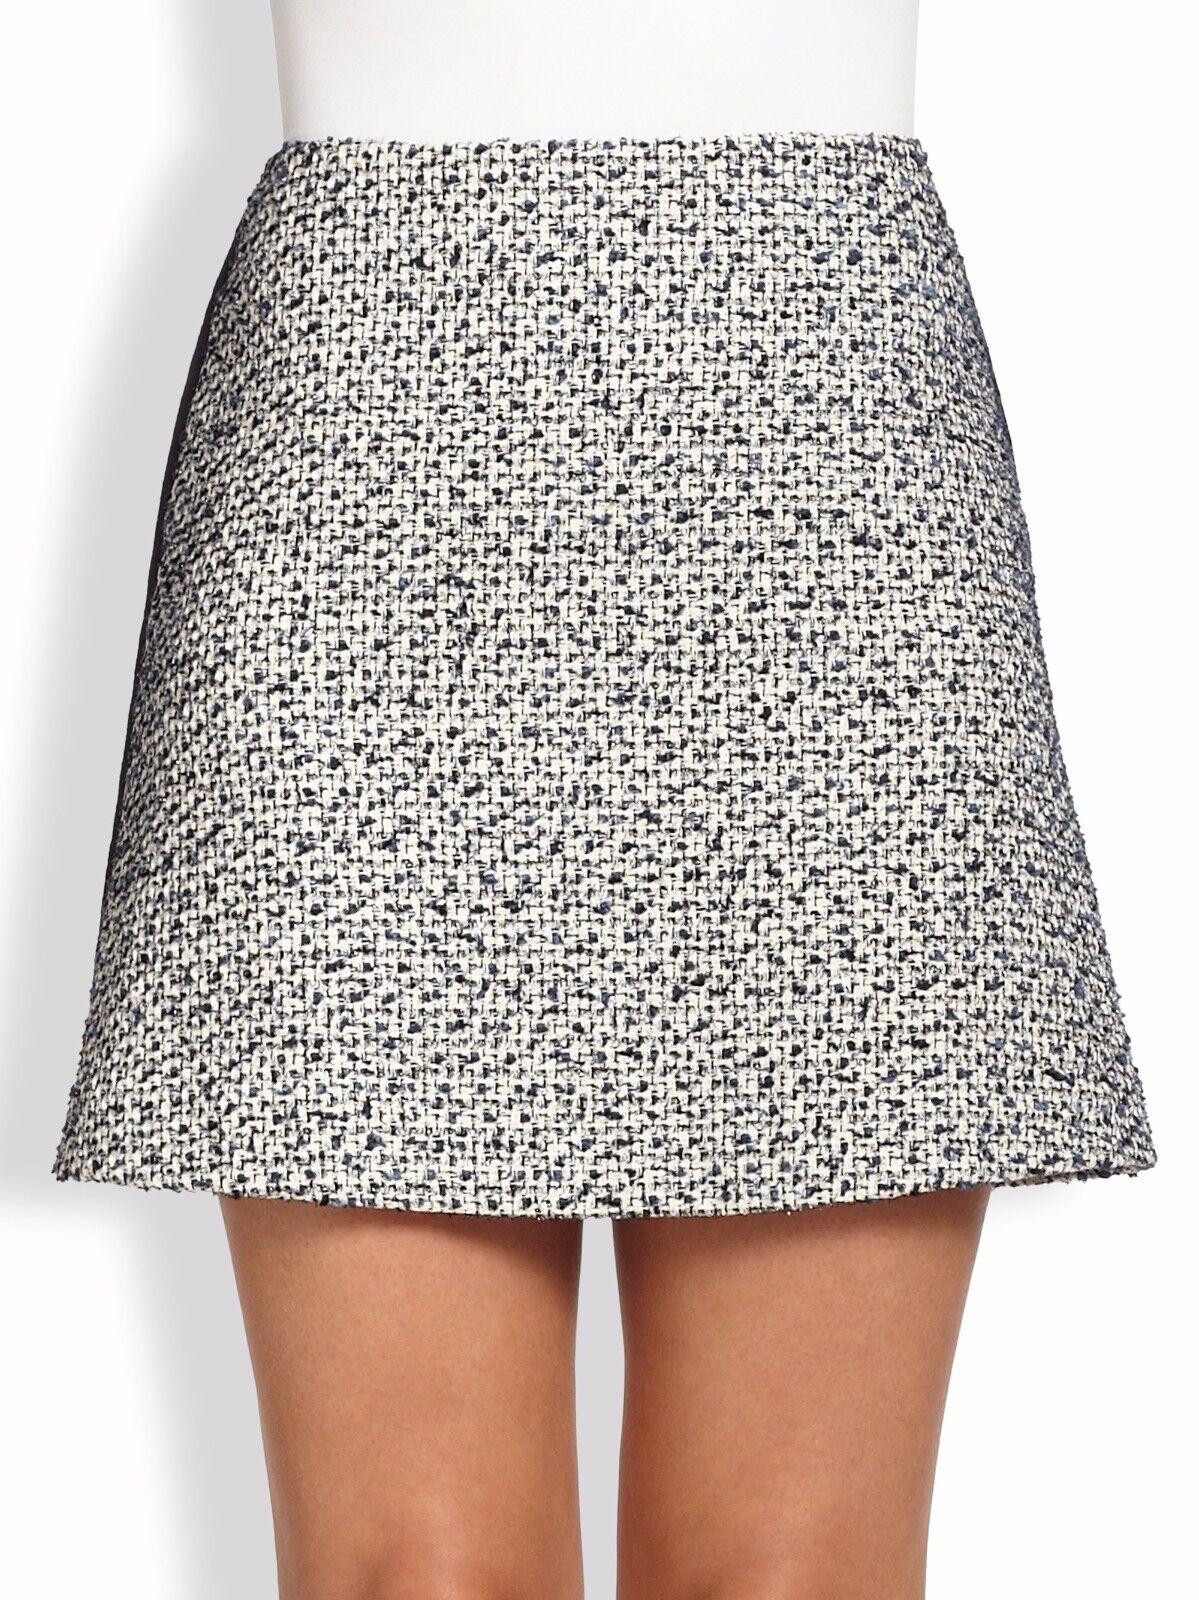 NWT Tory Burch Lucille Textured Metallic Tweed Skirt Navy  – Size 14